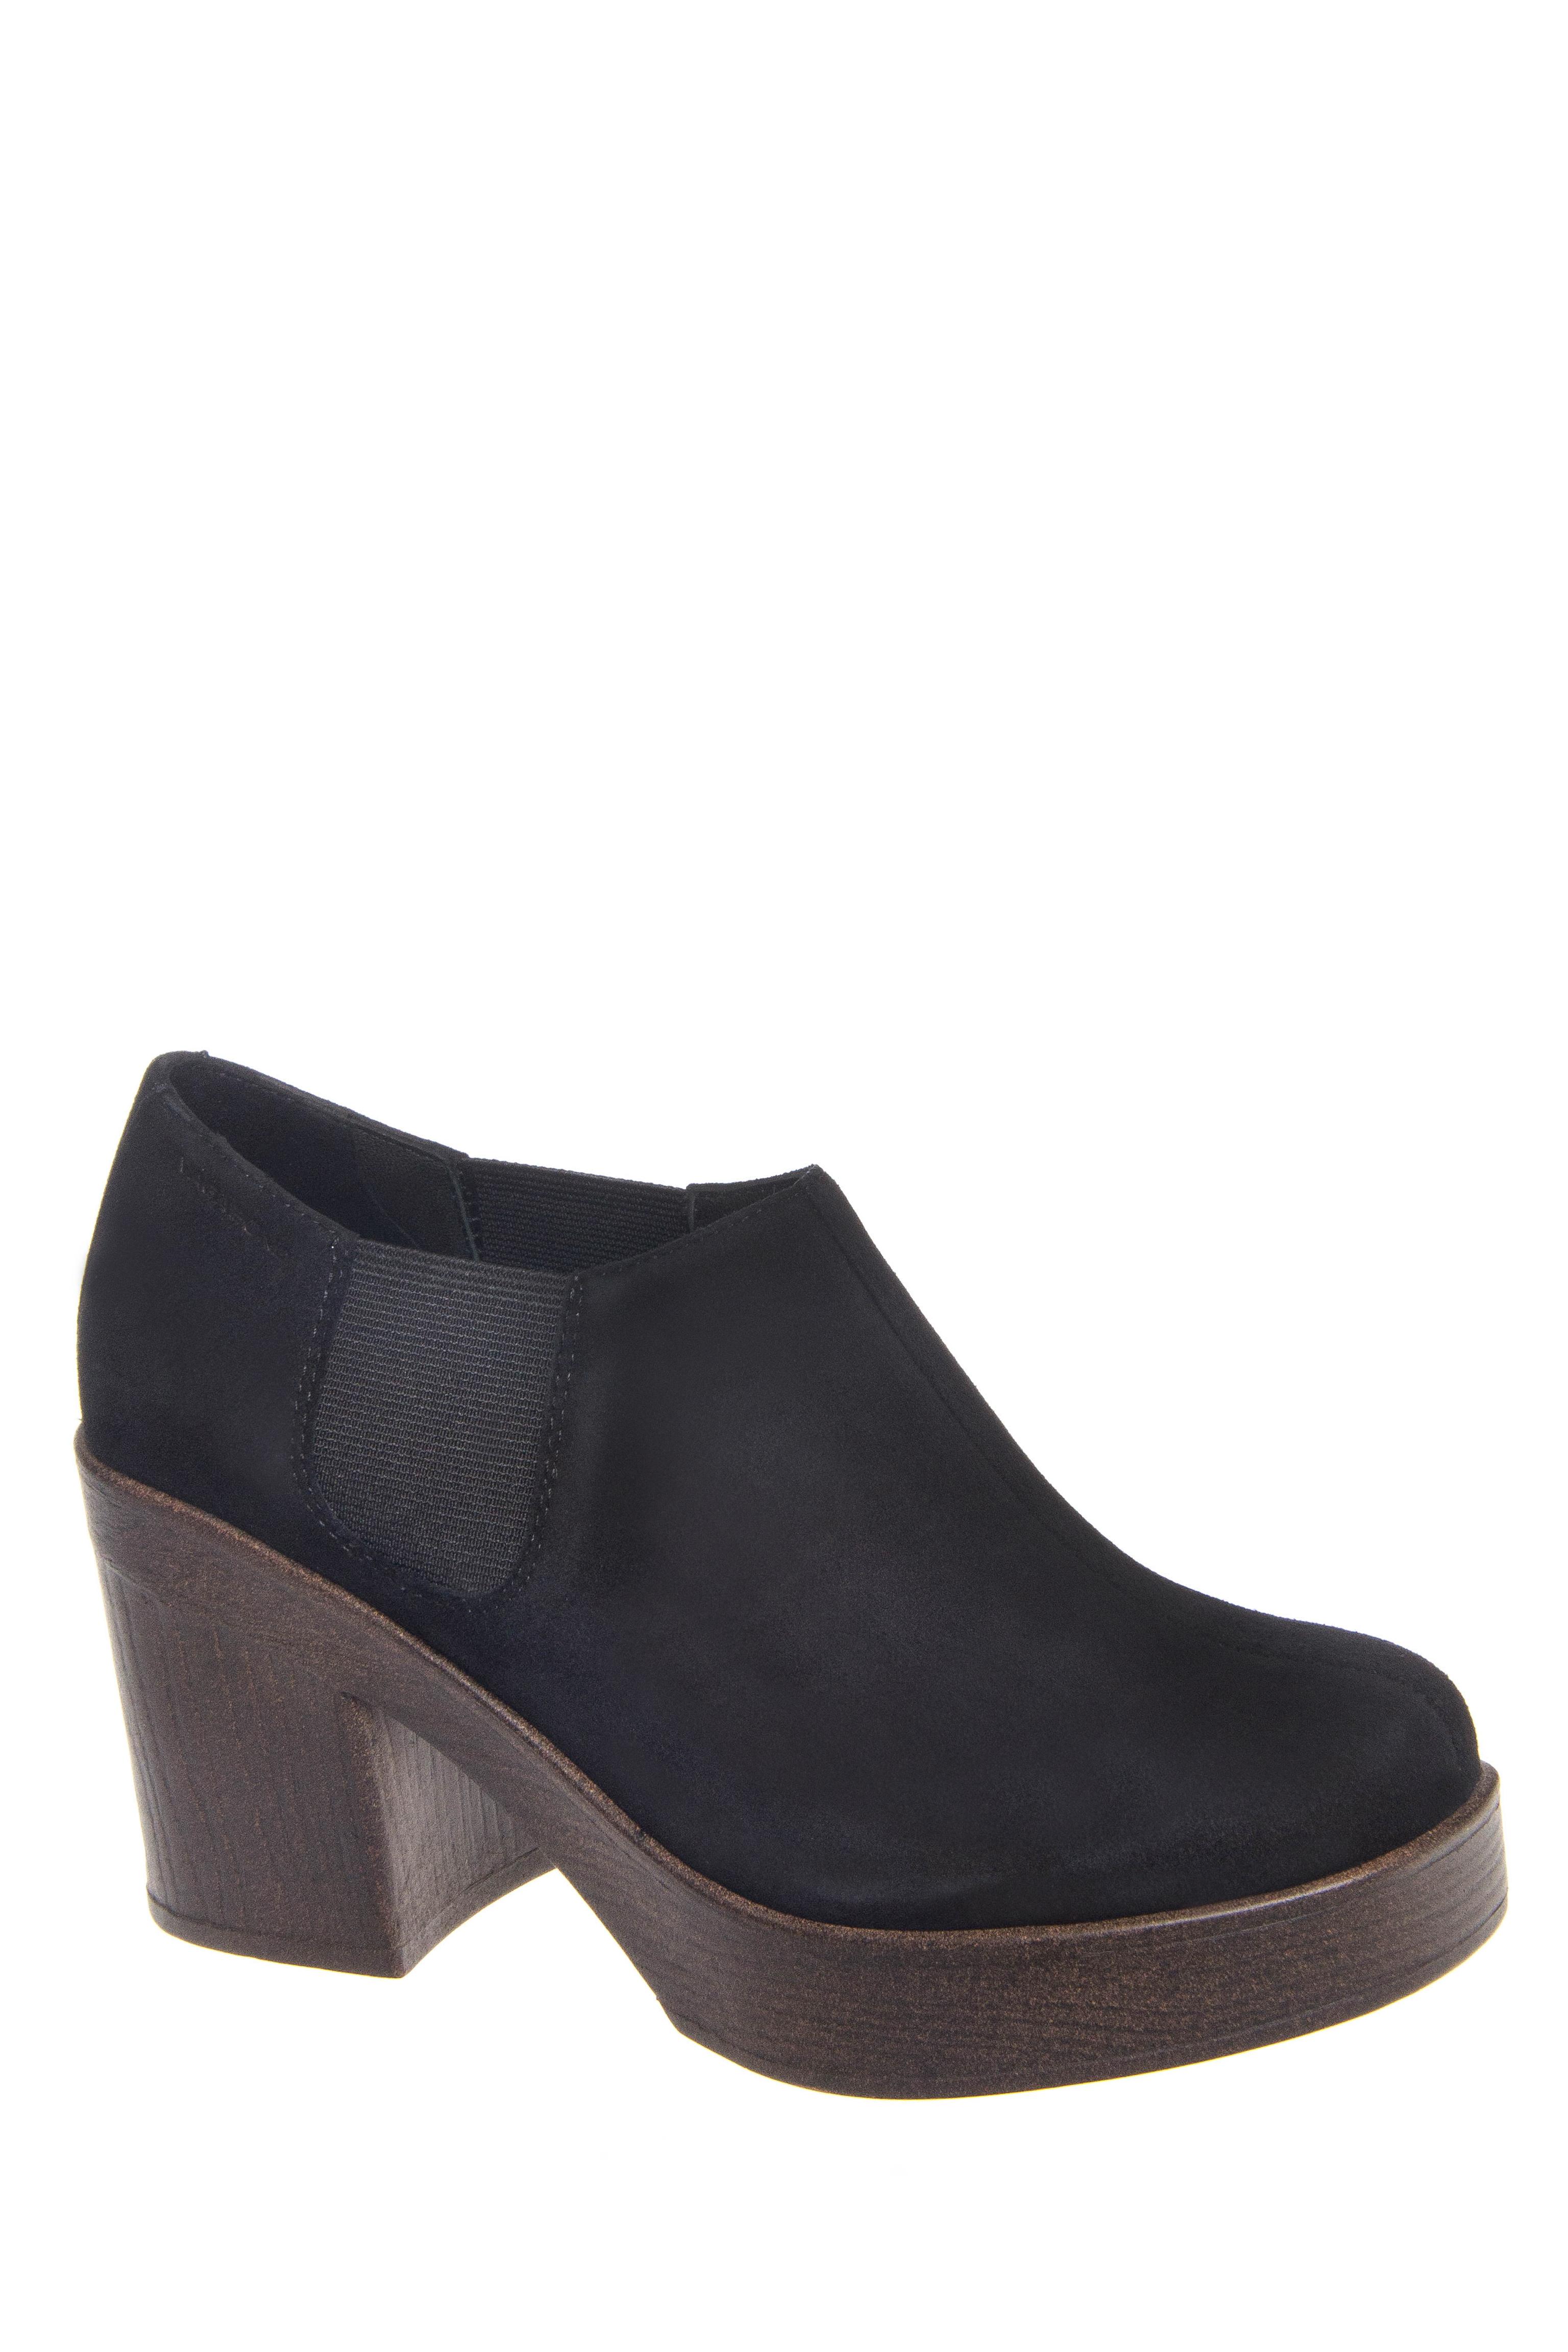 Vagabond Marva Mid Heel Platform Booties - Black